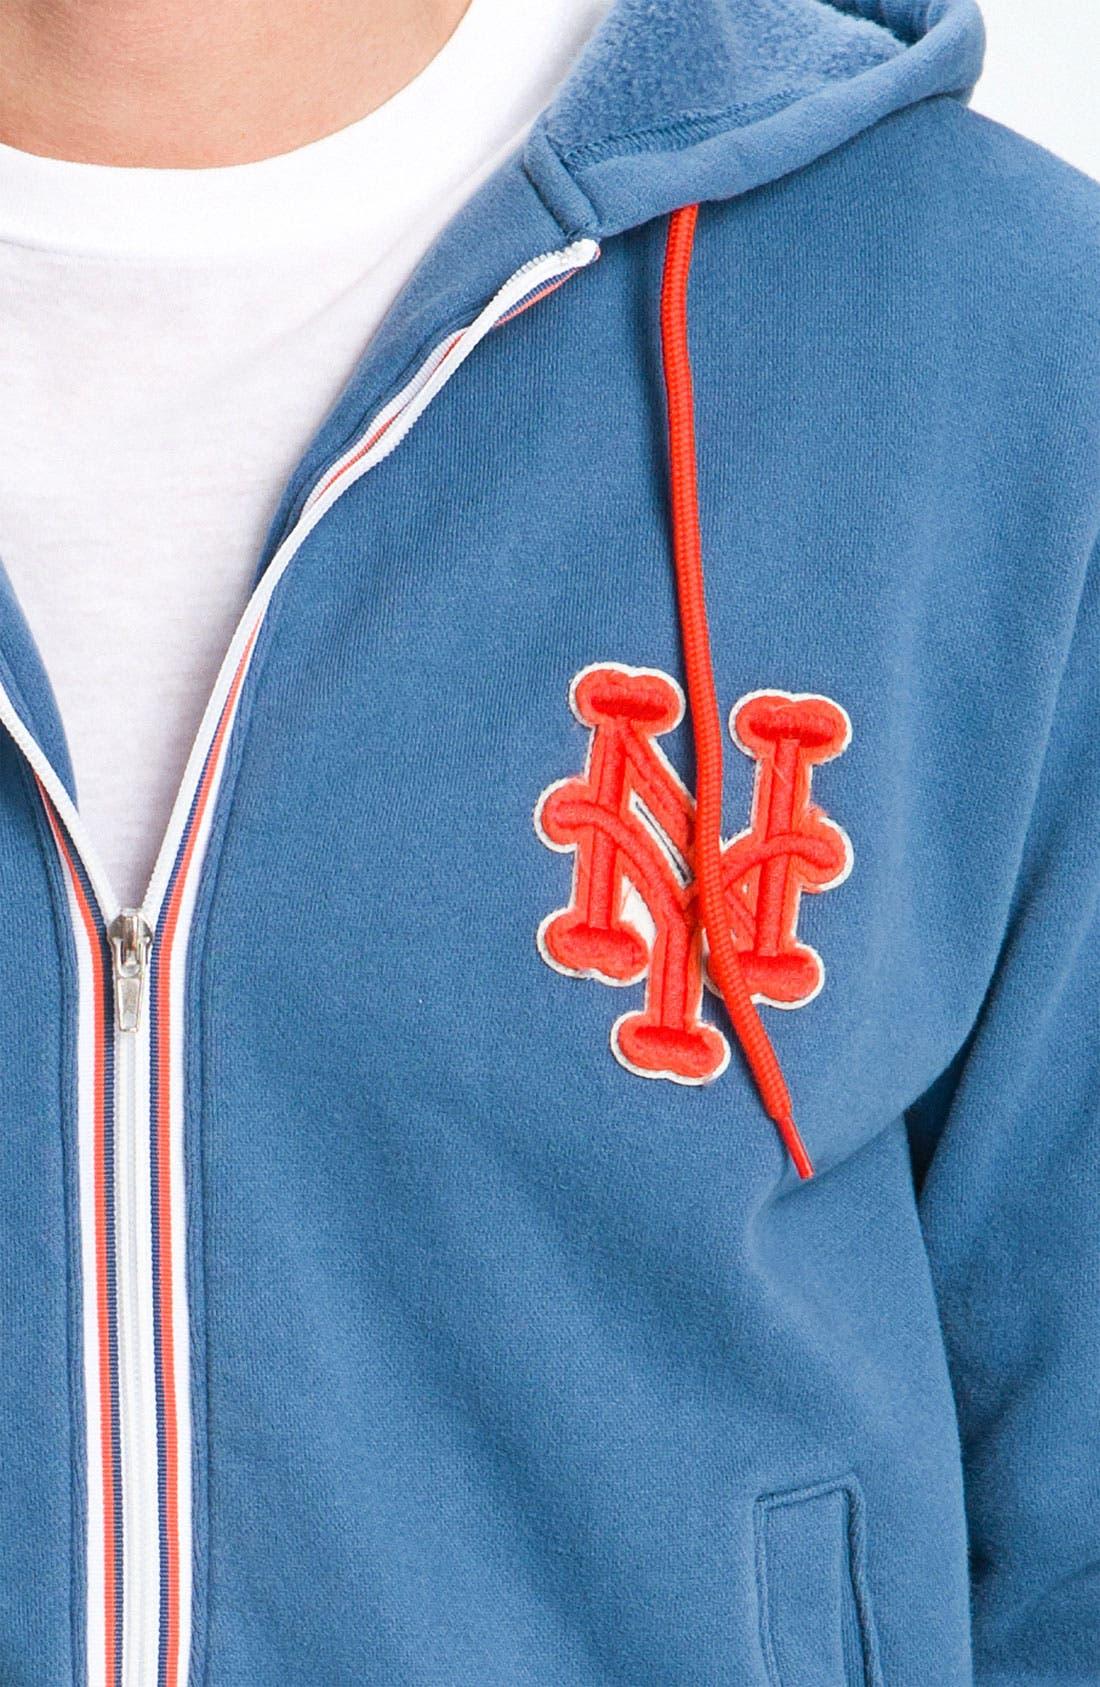 Alternate Image 3  - Wright & Ditson 'New York Mets' Hoodie